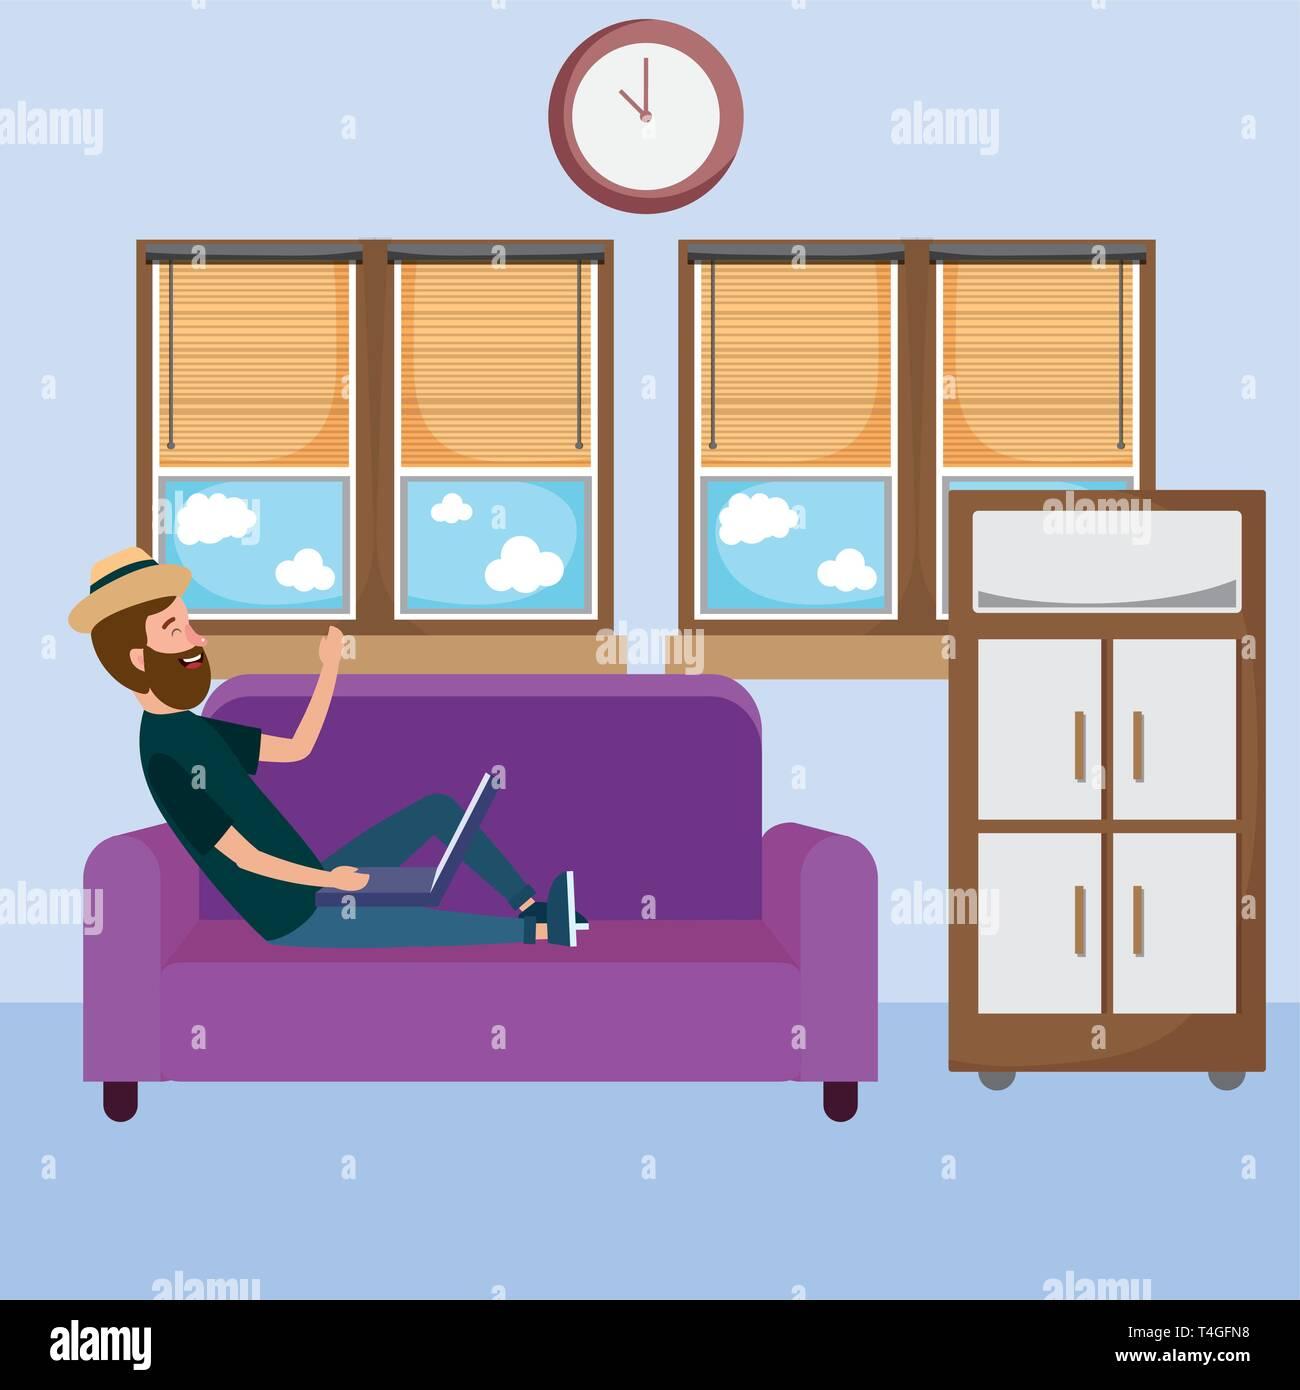 Online Education Man Using Laptop Device Cartoon Vector Illustration Graphic Design Stock Vector Image Art Alamy